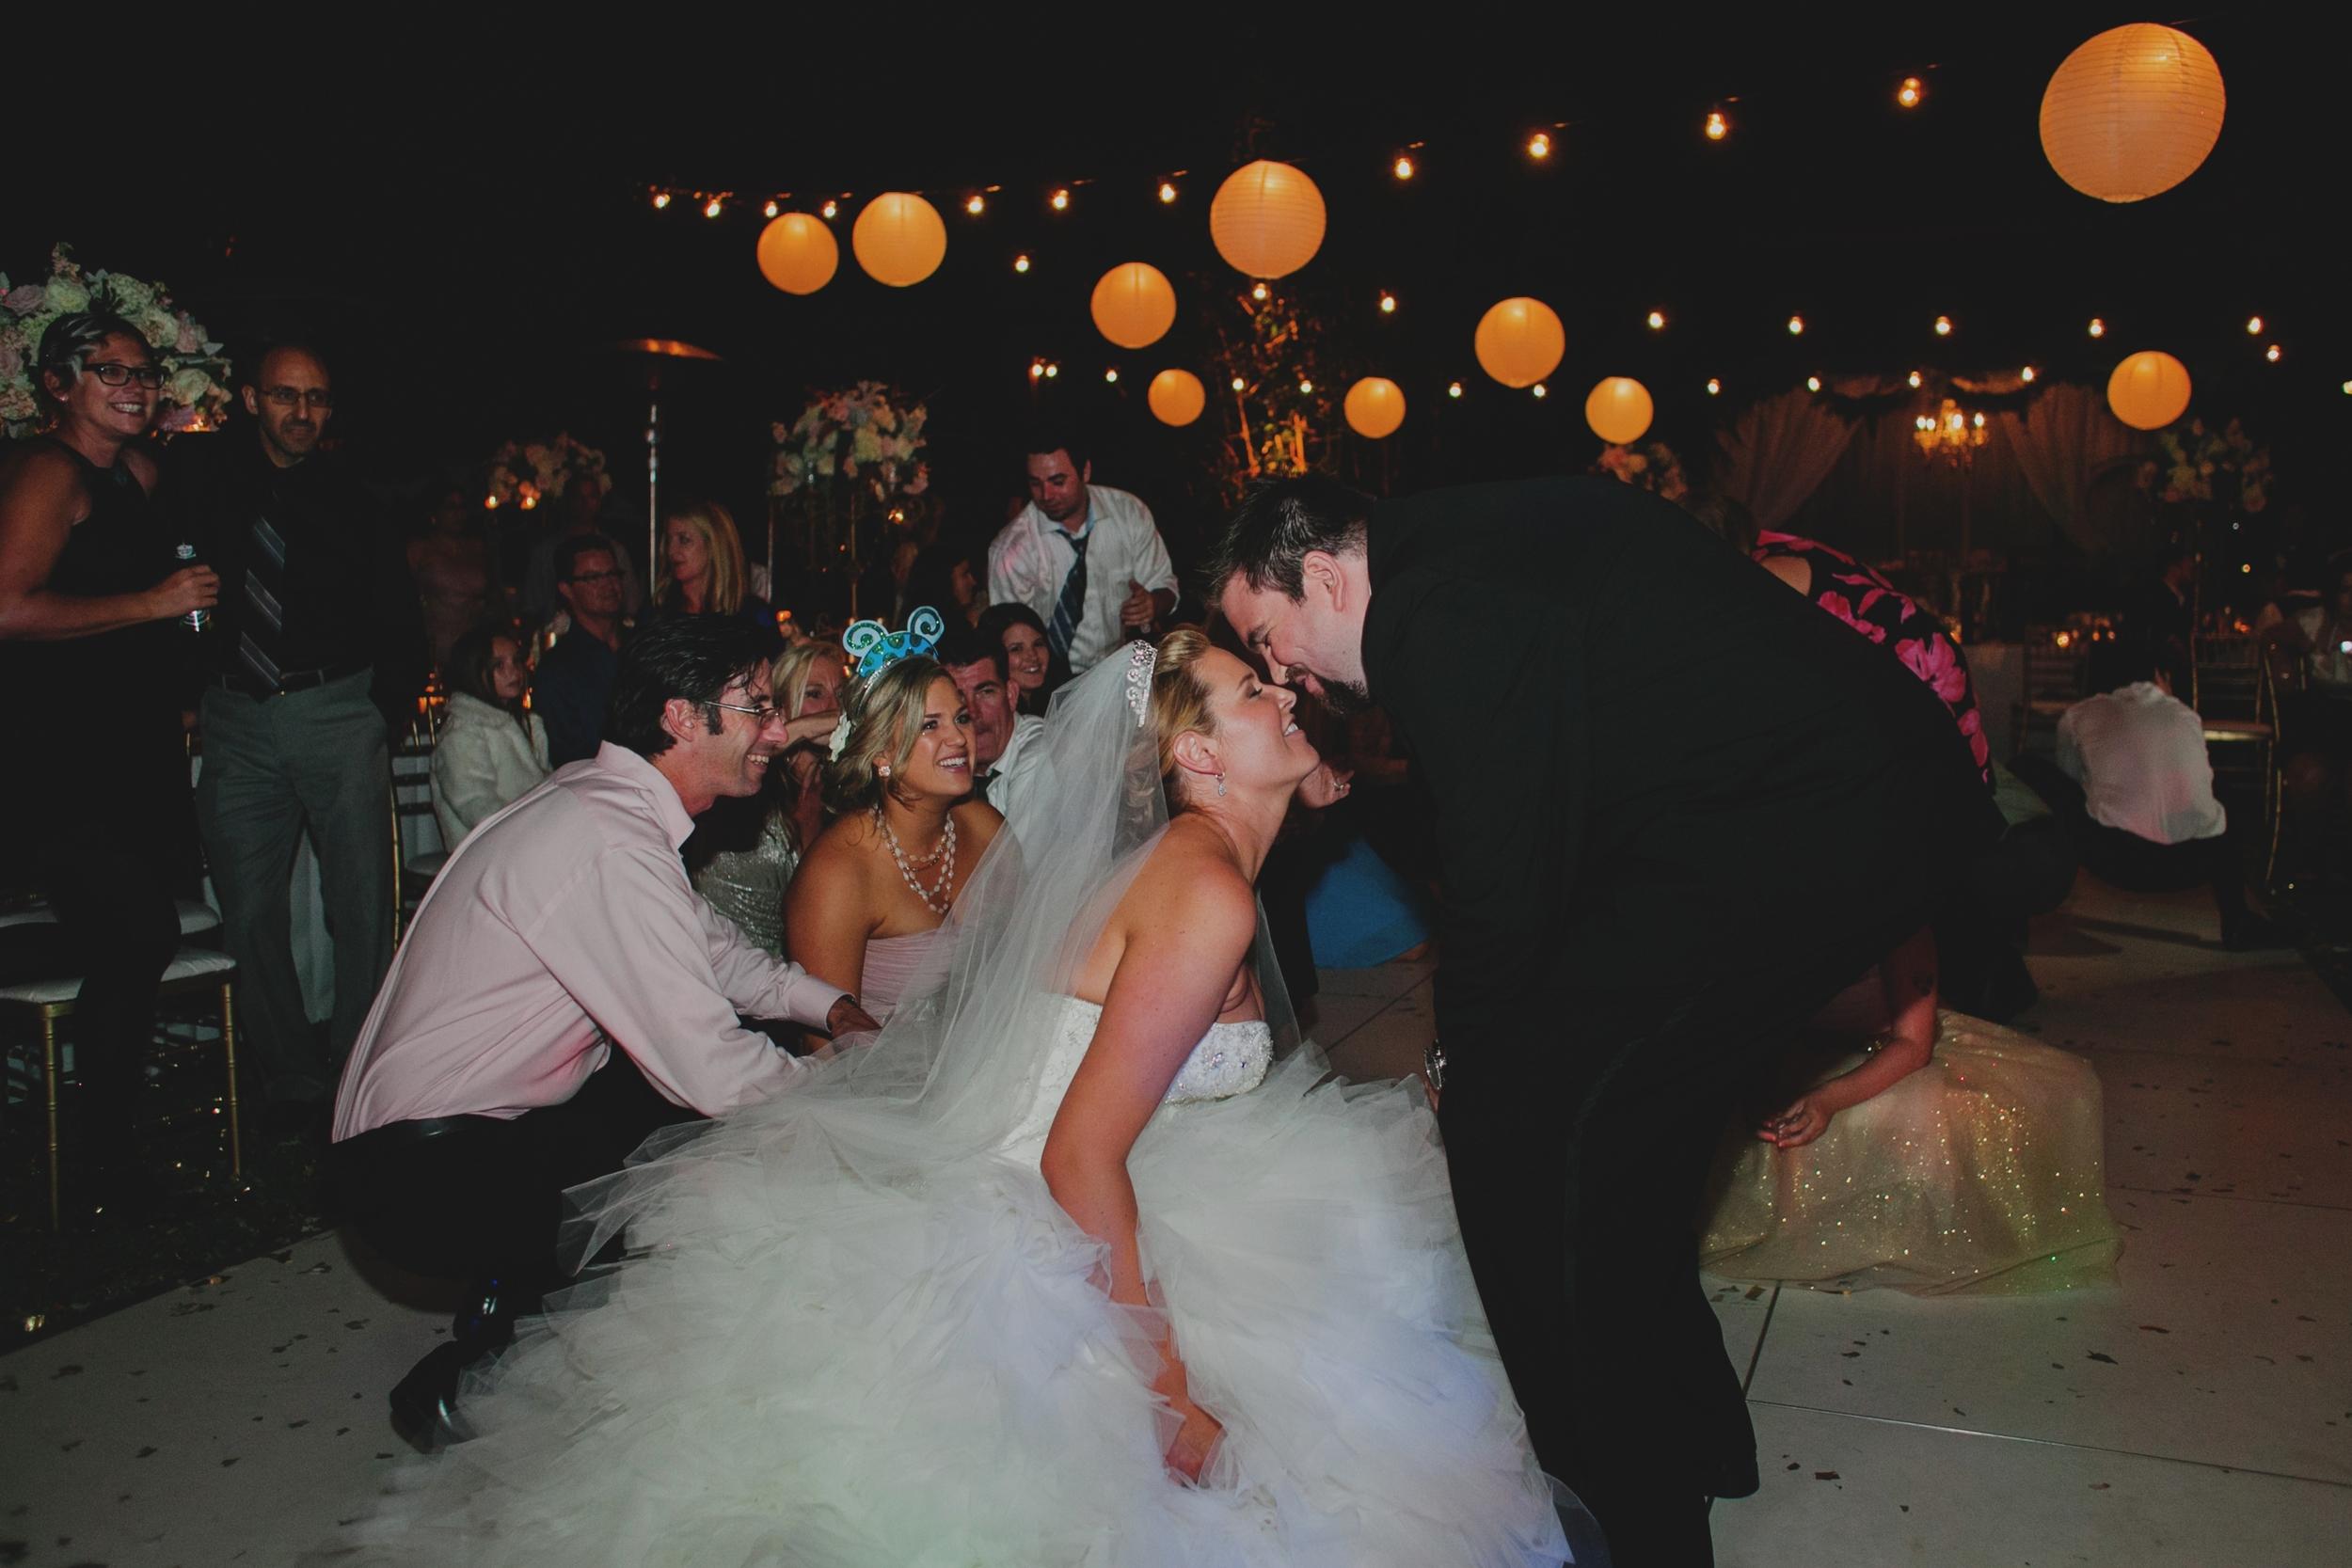 The-Suitcase-Studio-Timree-Matt-Lifestyle-Wedding-Photographer-119.jpg